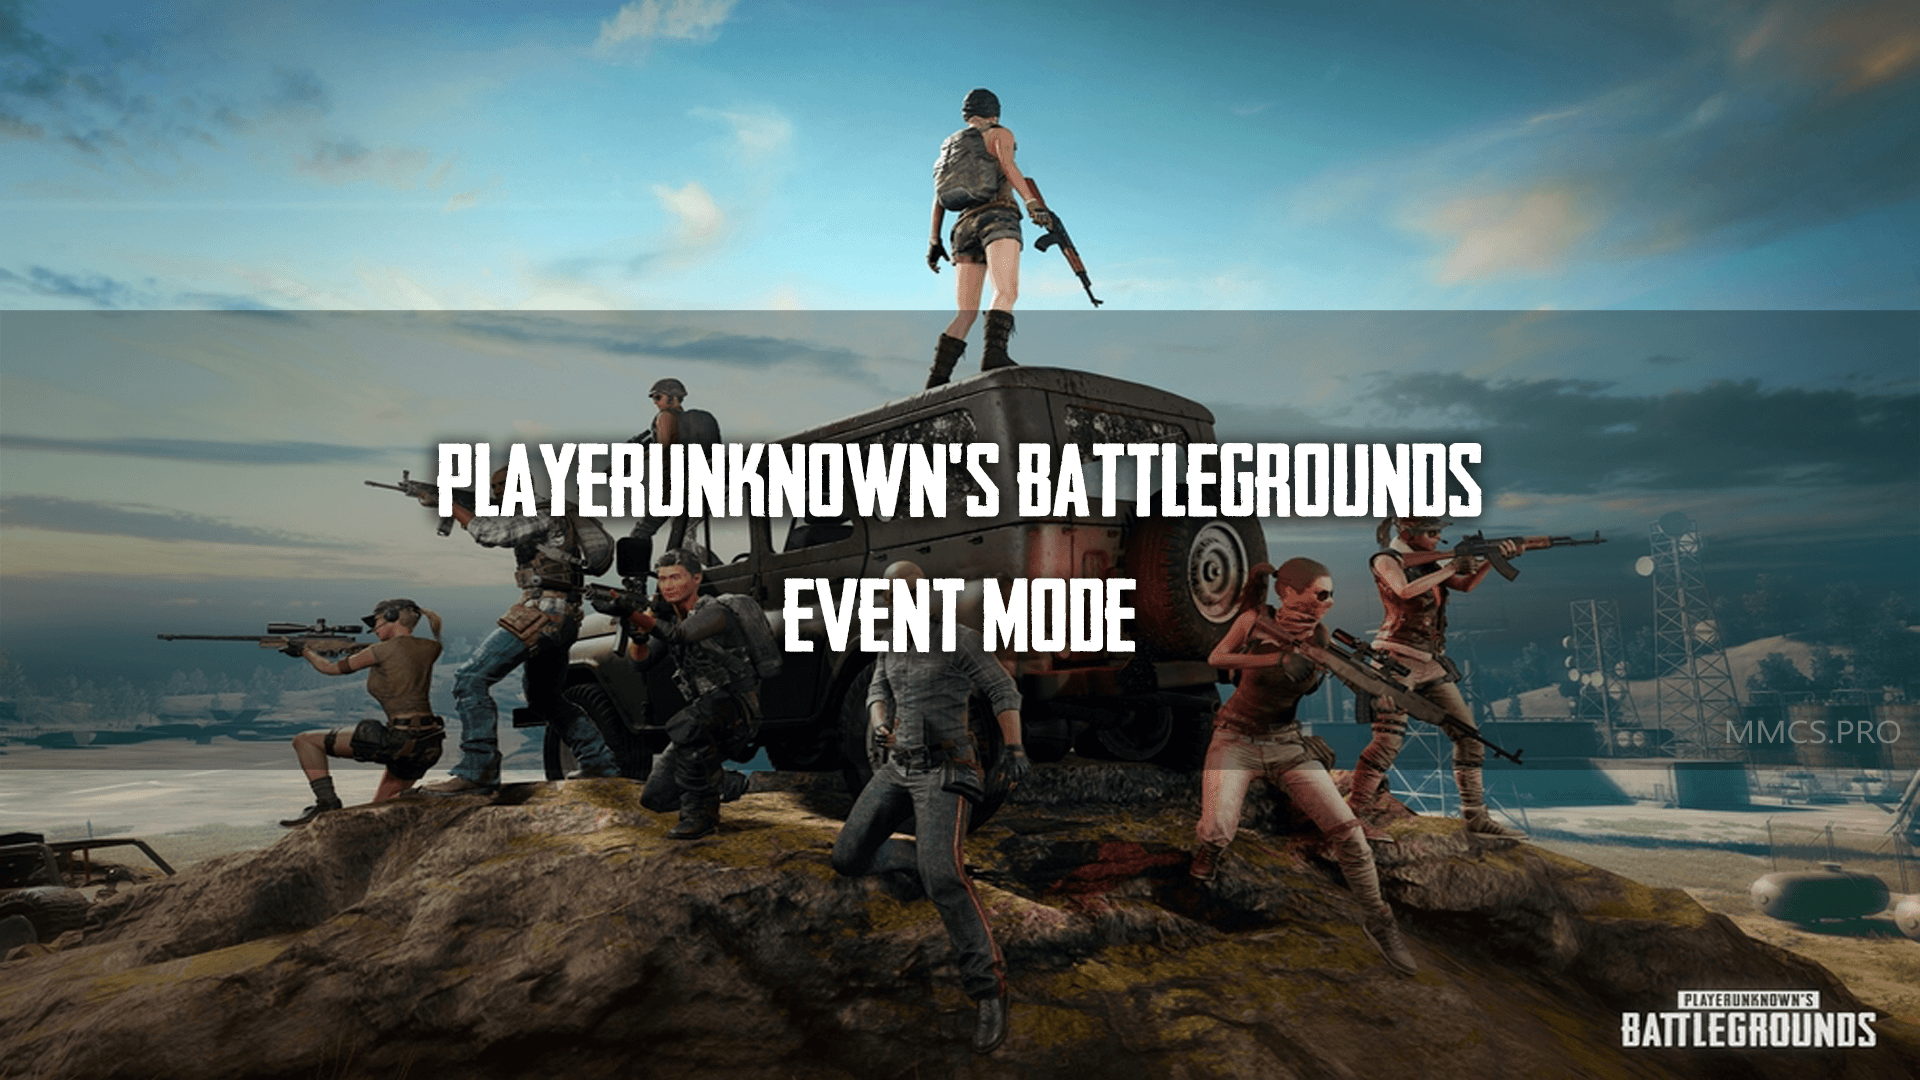 https://mmcs.pro/pubg-rezhim-sobytij-event-mode/